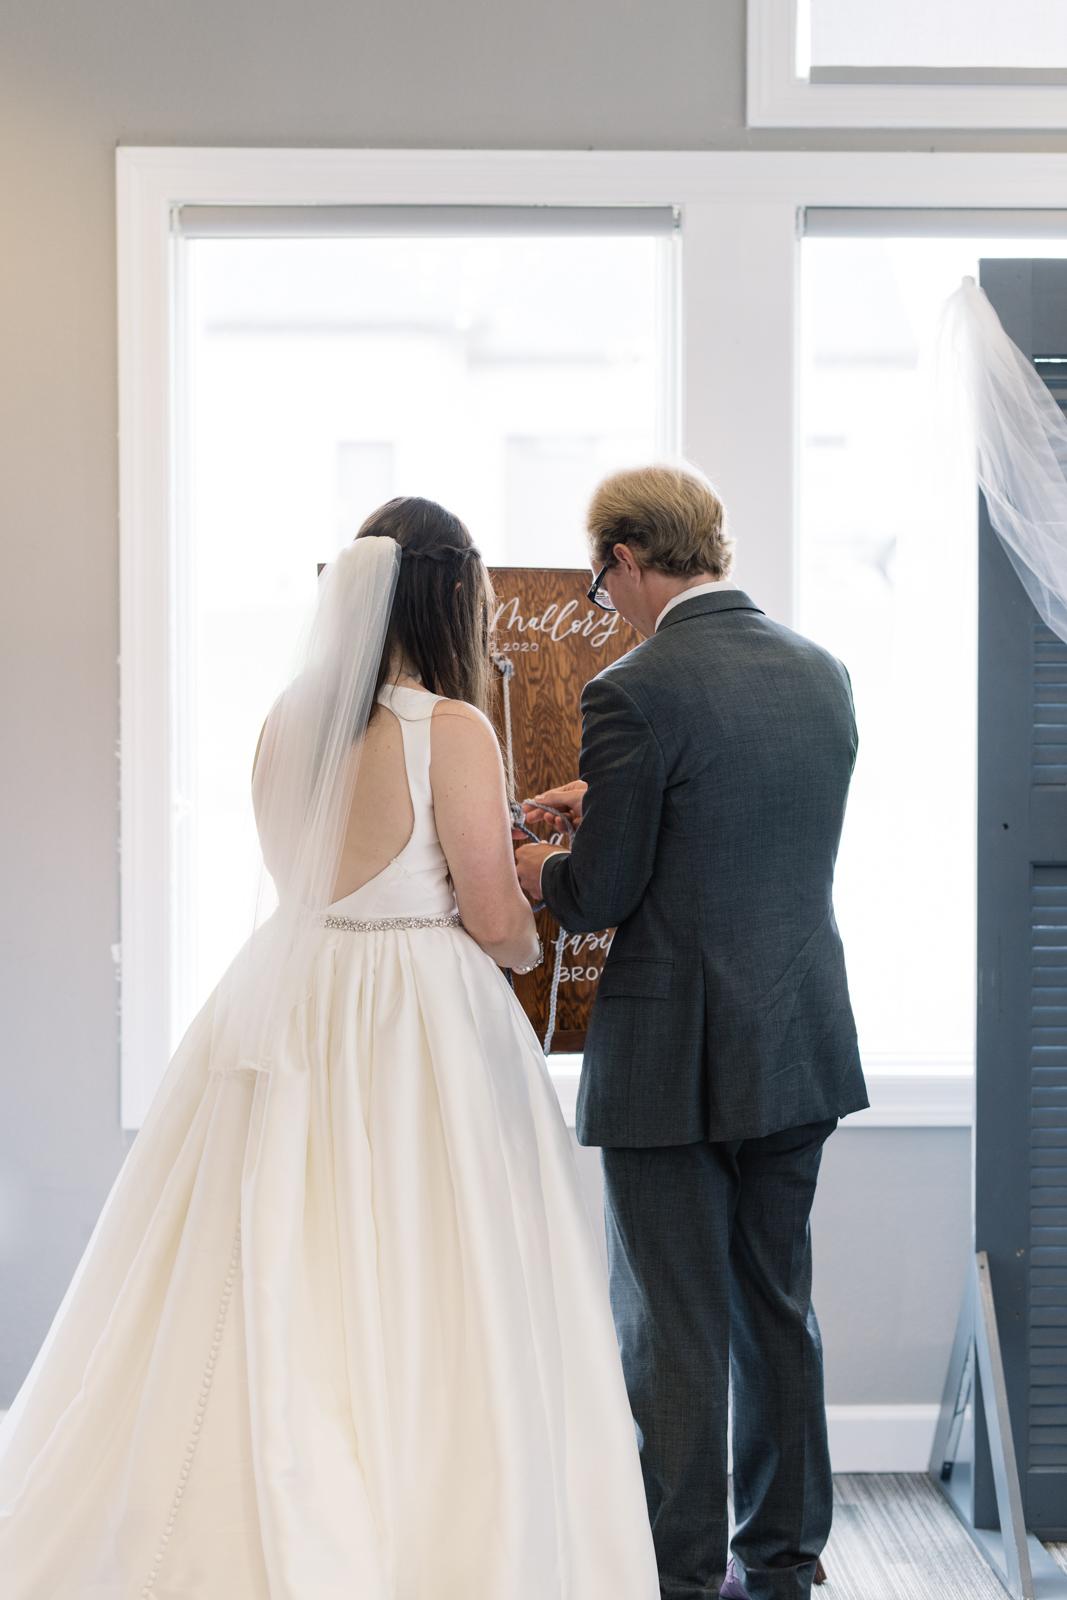 knot ceremony during wedding fox ridge golf course wedding